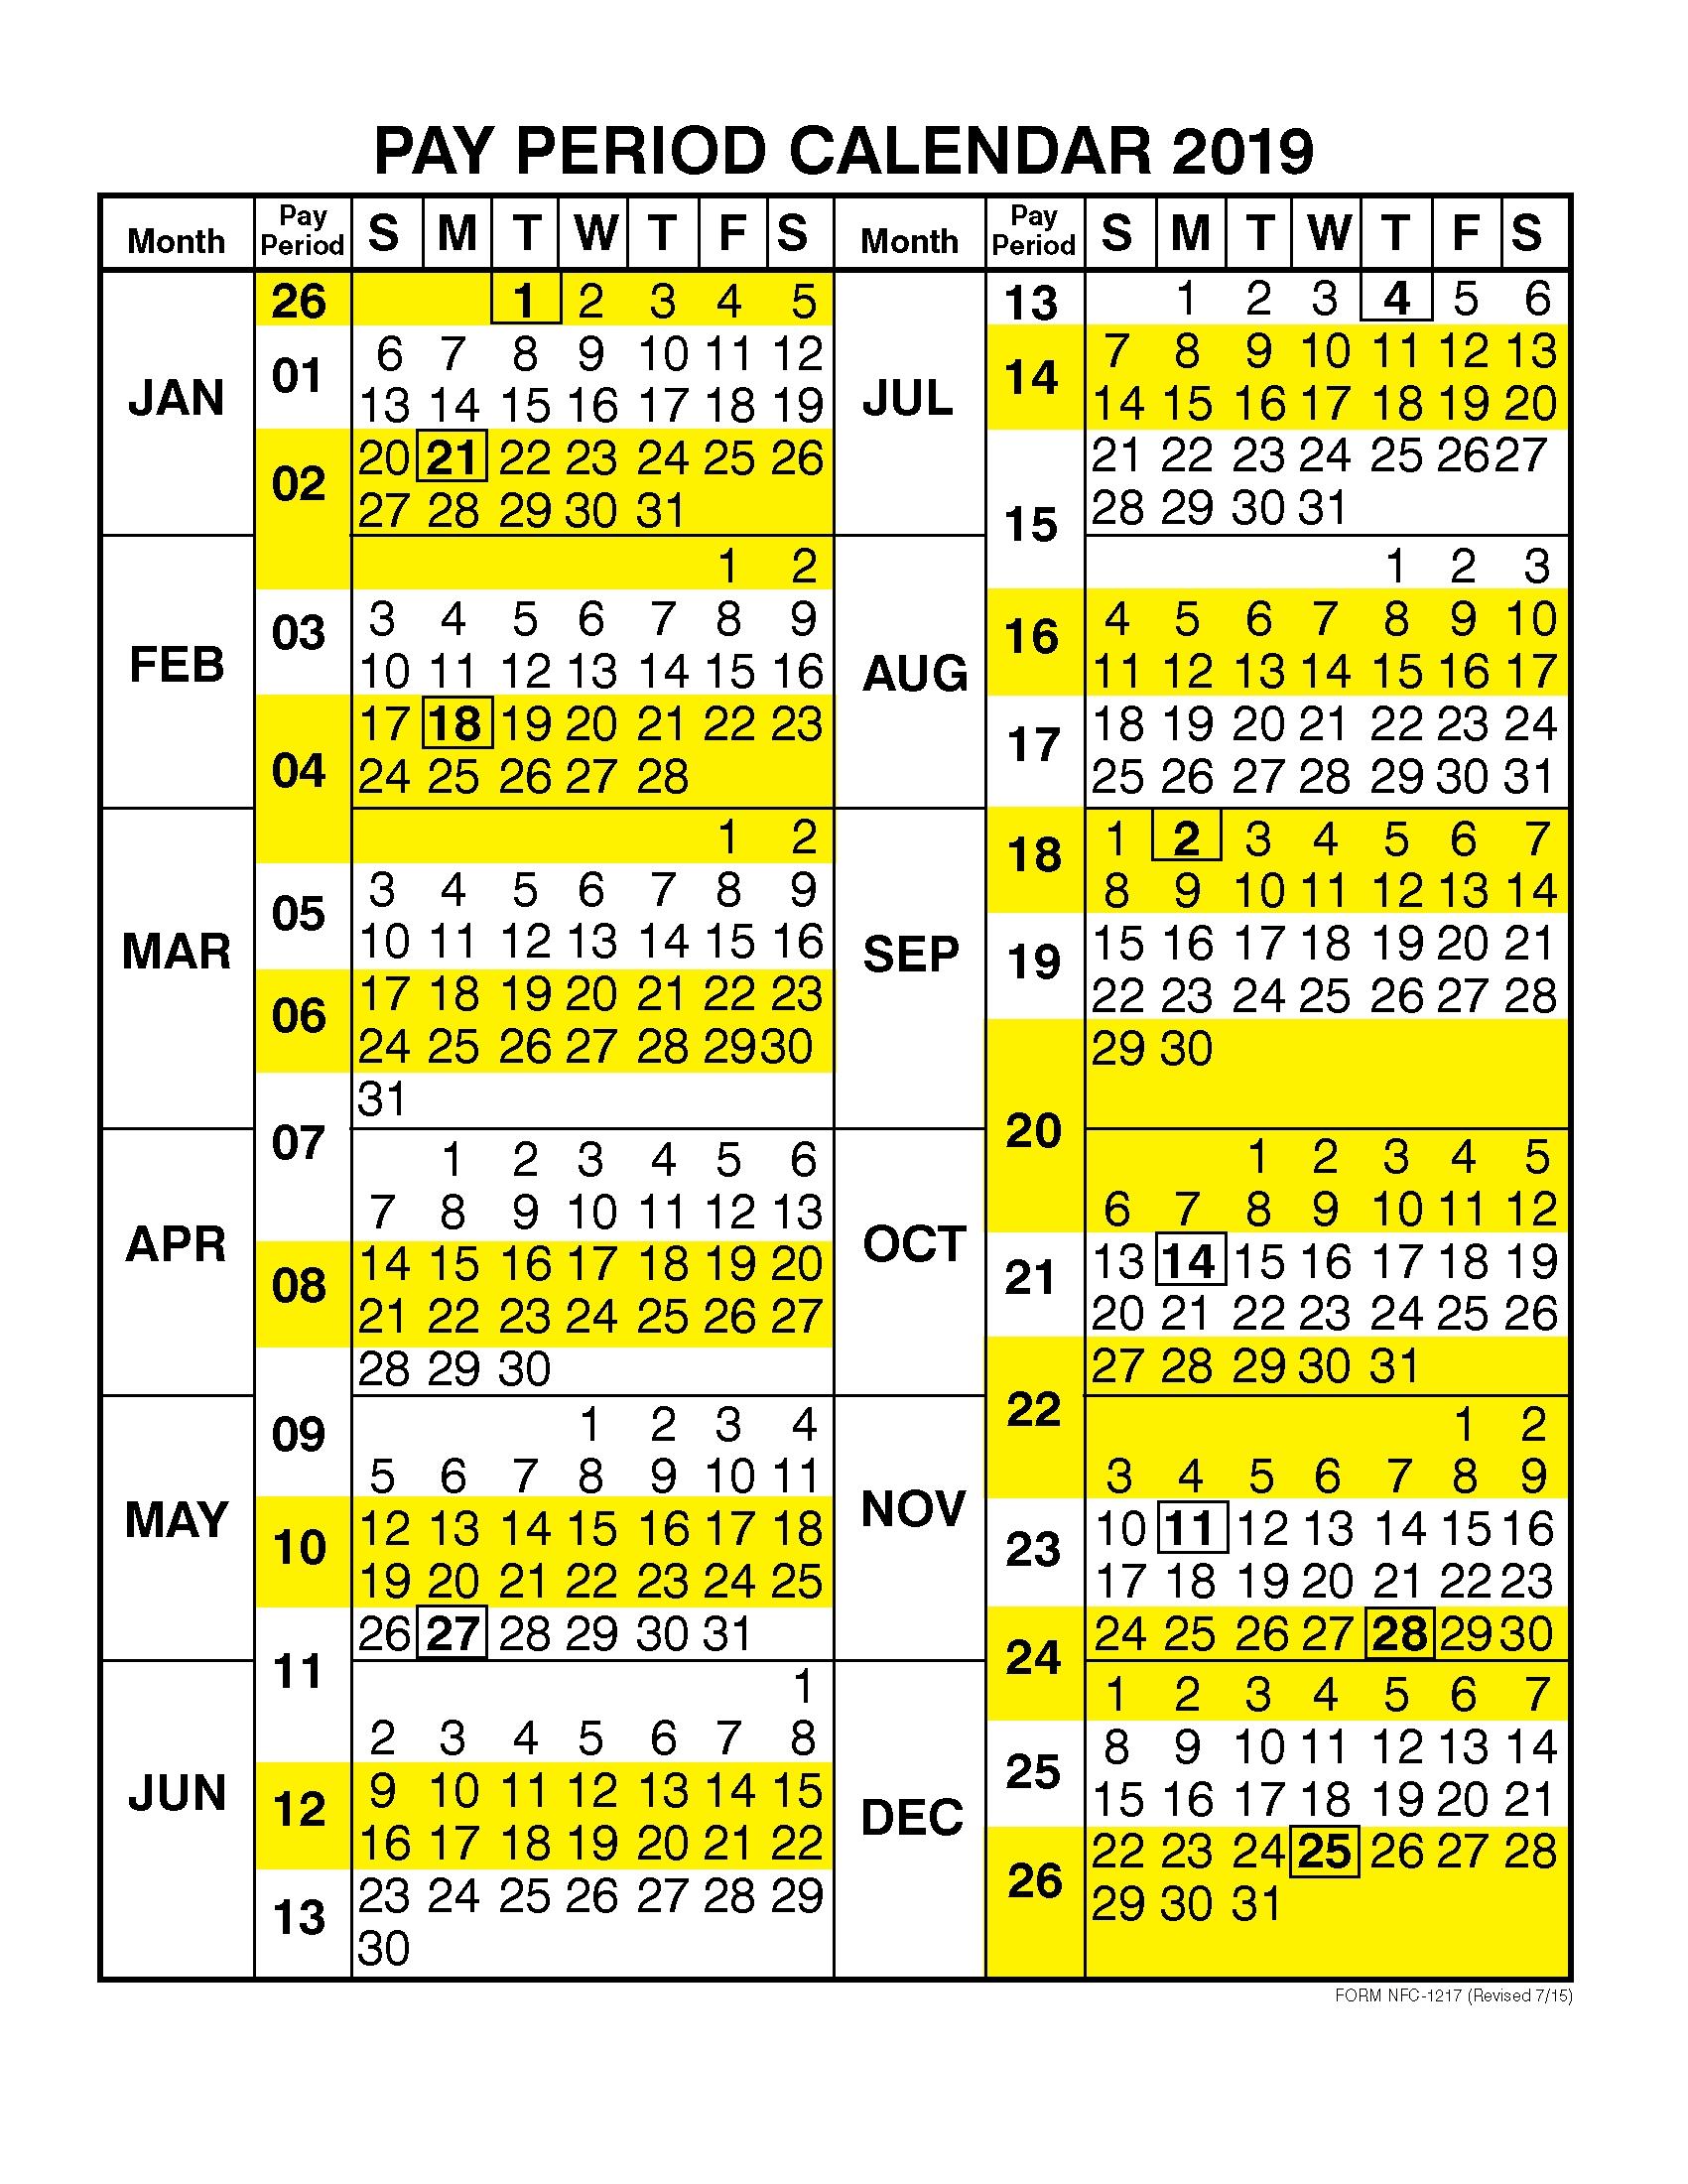 Pay Period Calendar 2019 Usda | Payroll Calendars 2020  2020 Federal Pay Period Calendar Printable